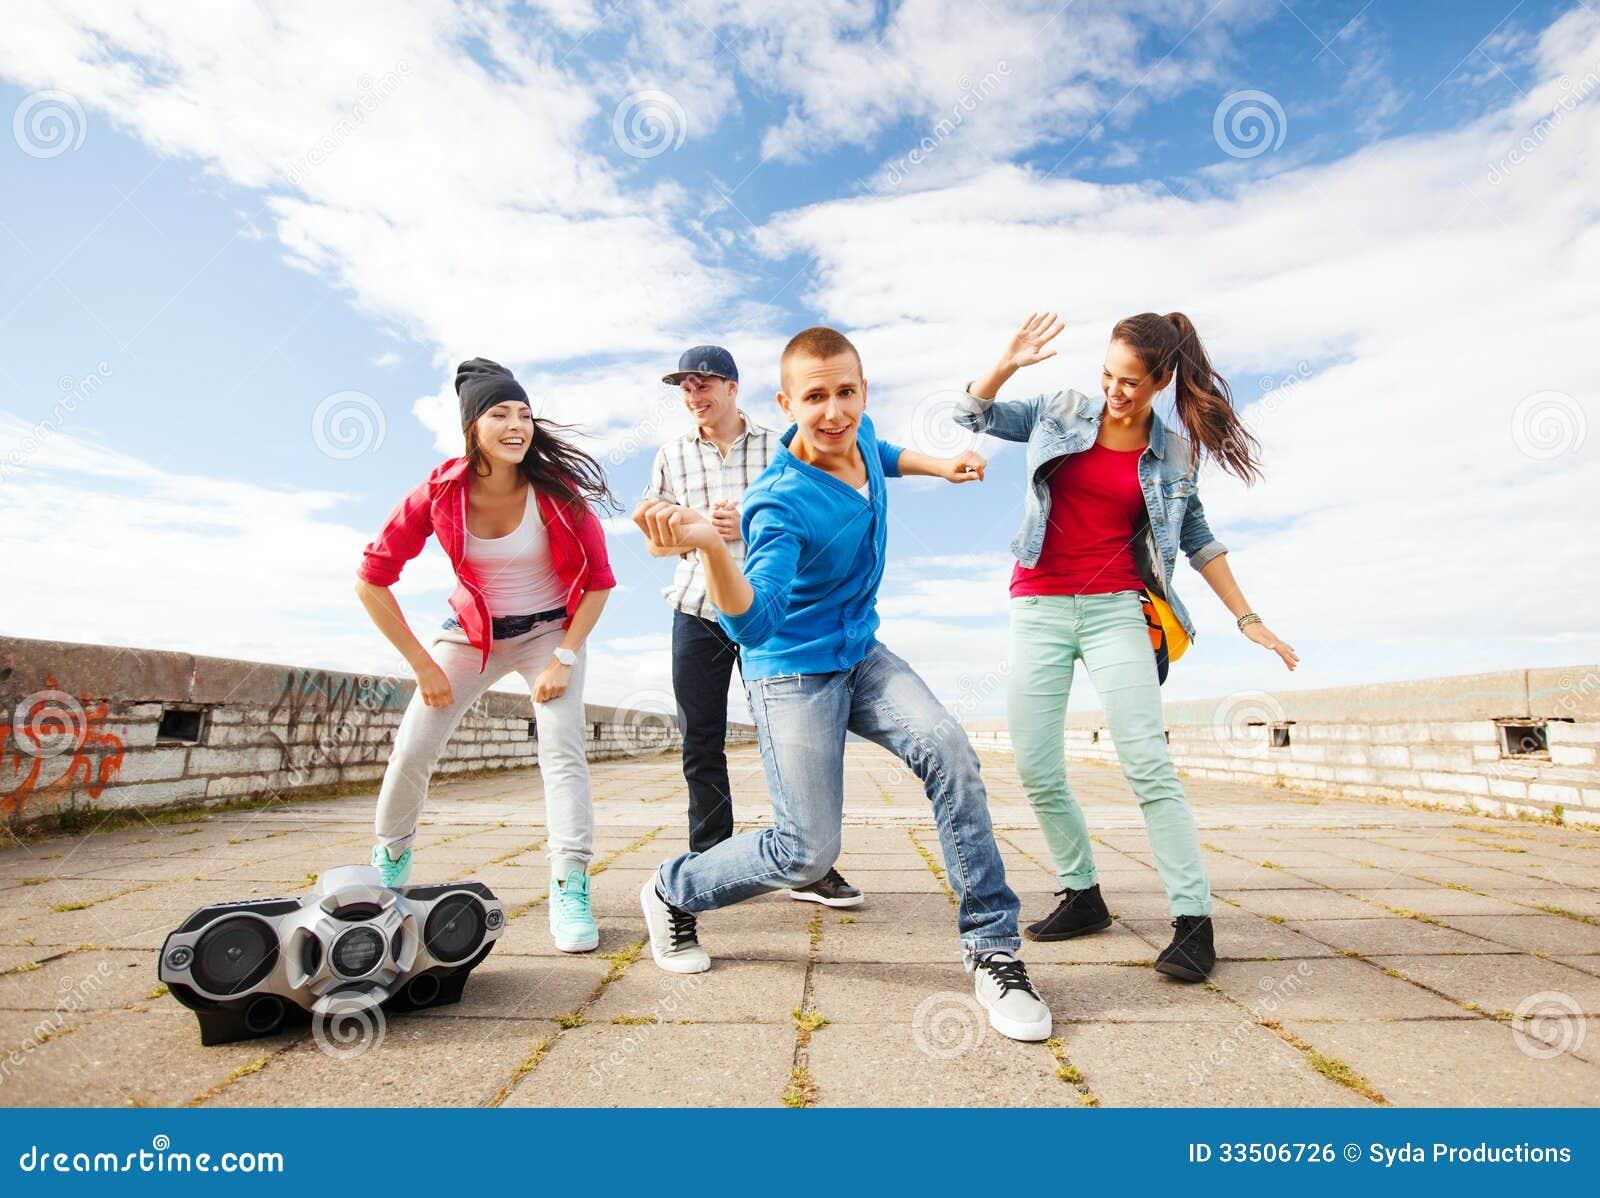 Yoyo Clipart Group Of Teenagers Dan...